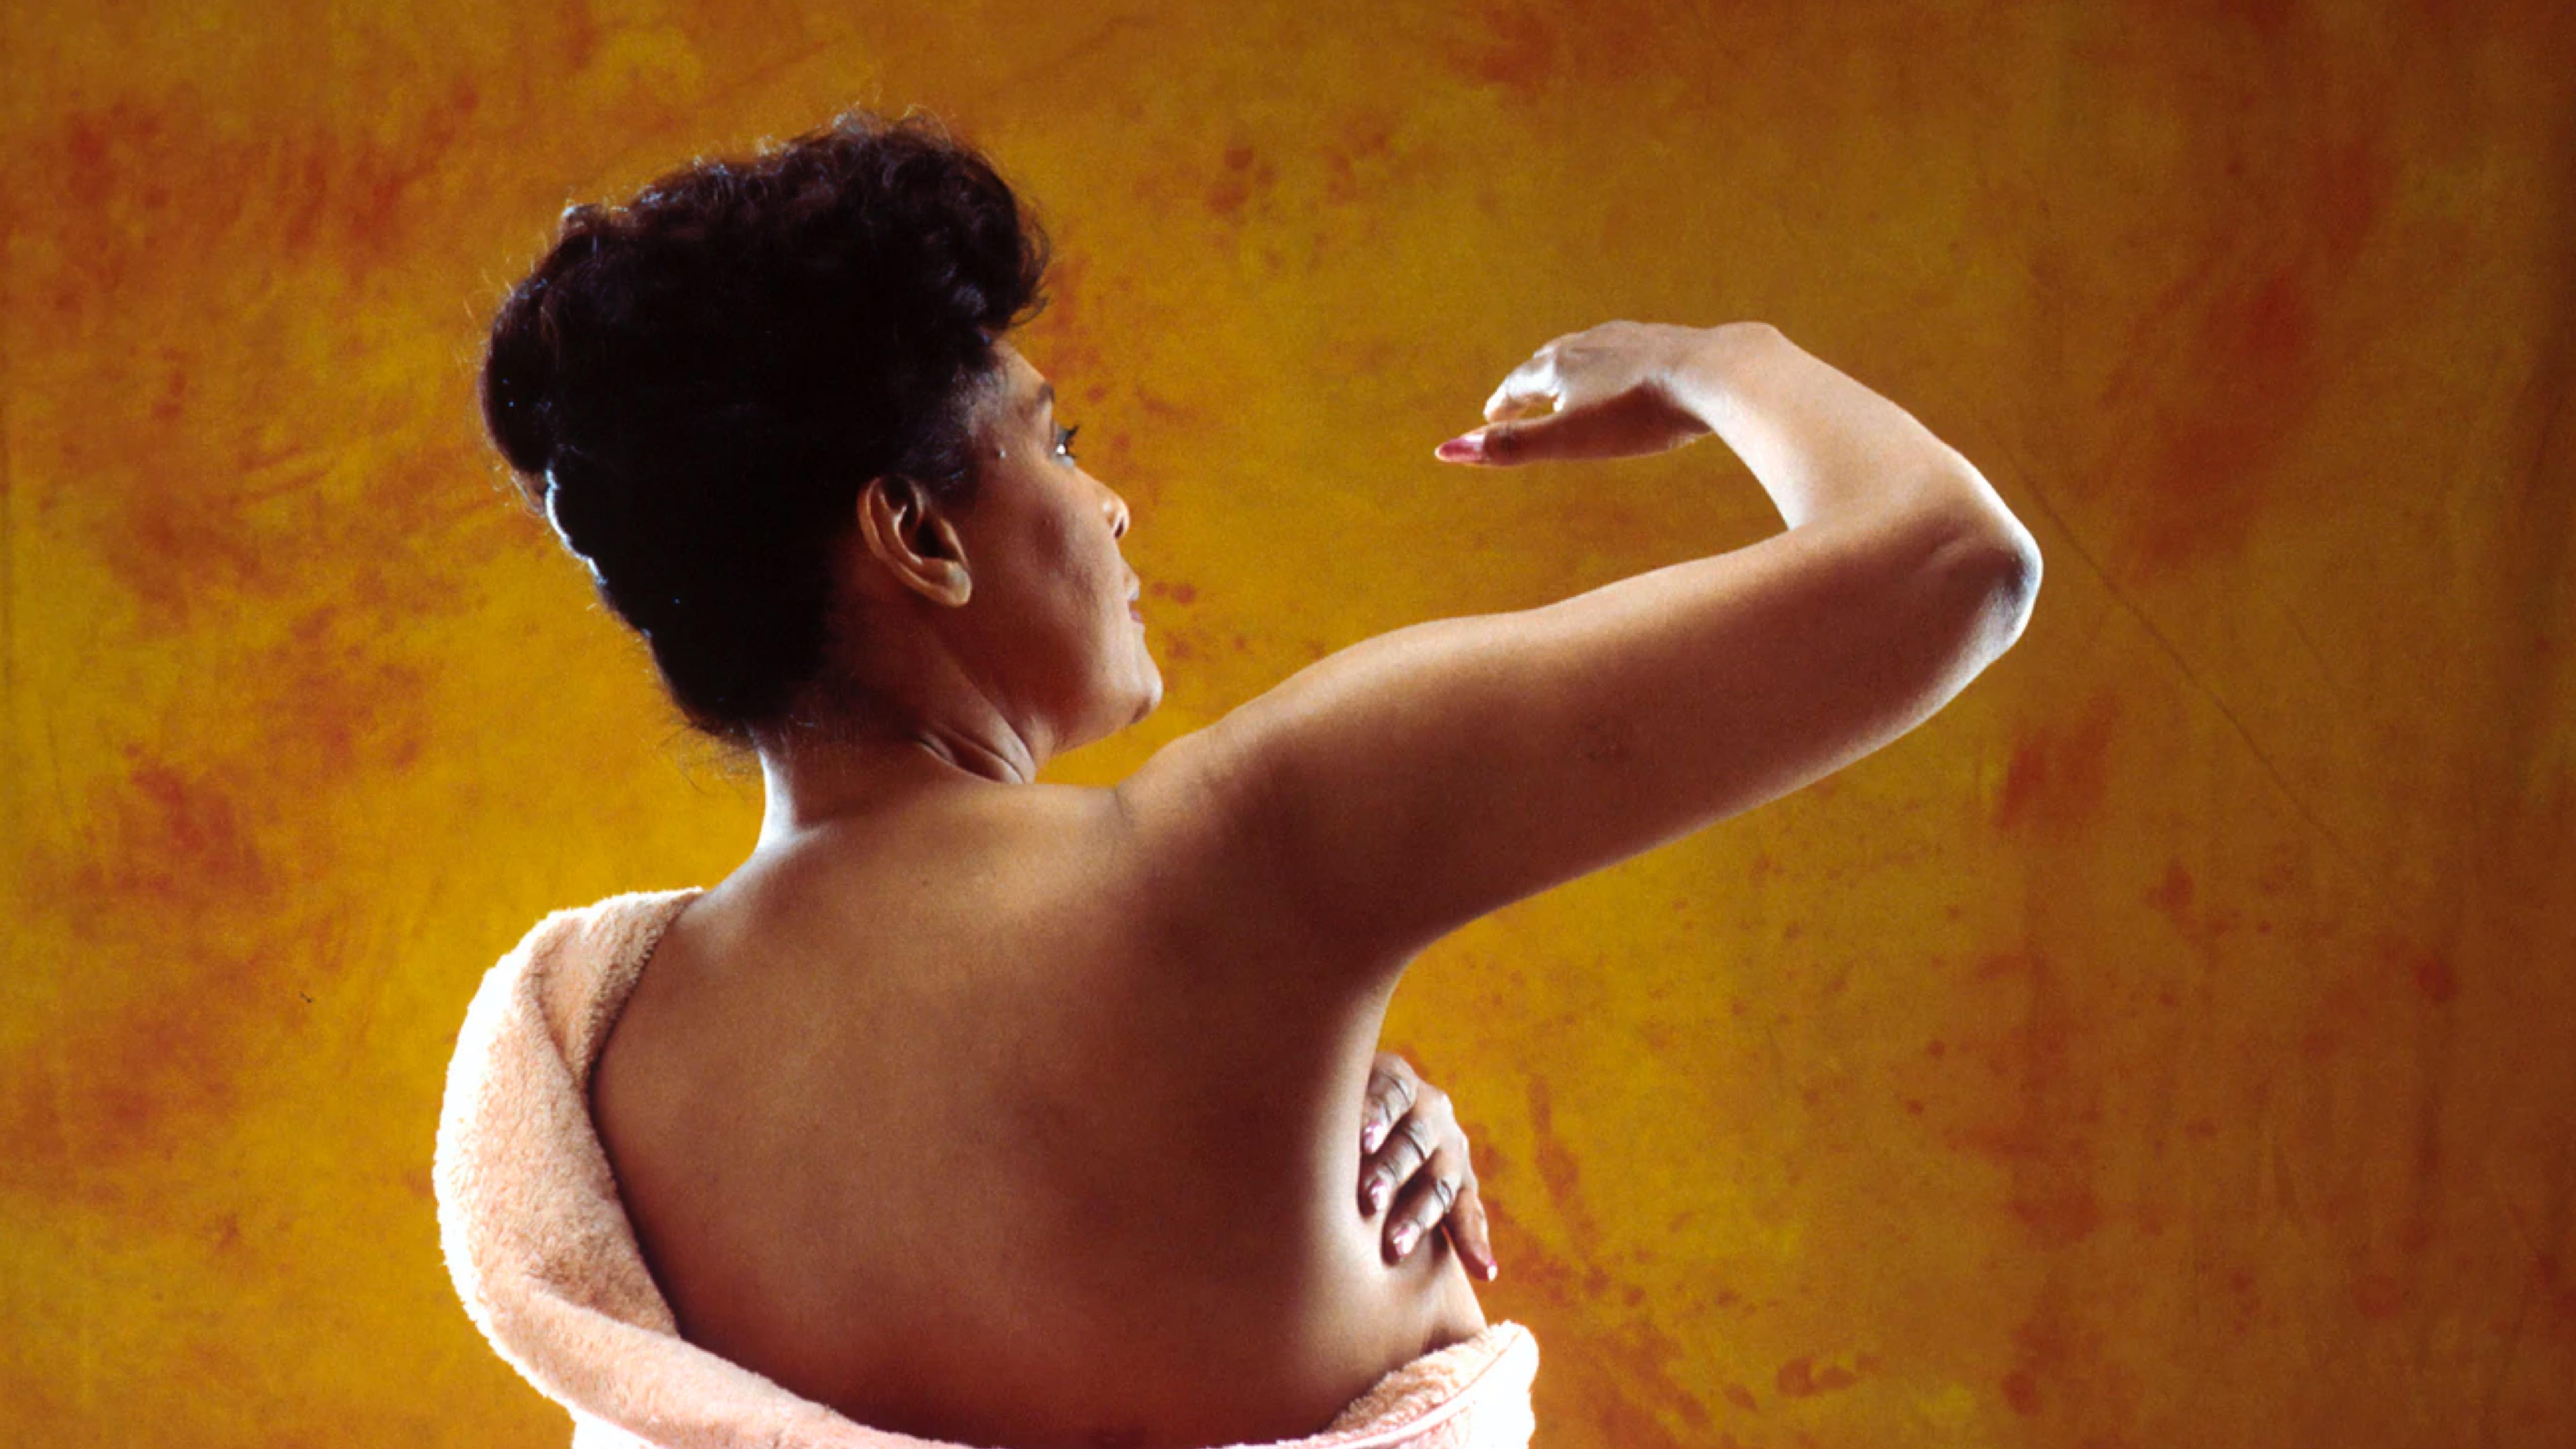 Cancer de mama, juarez, autoexplorarse, prevencion, octubre mes de lucha vs cancer